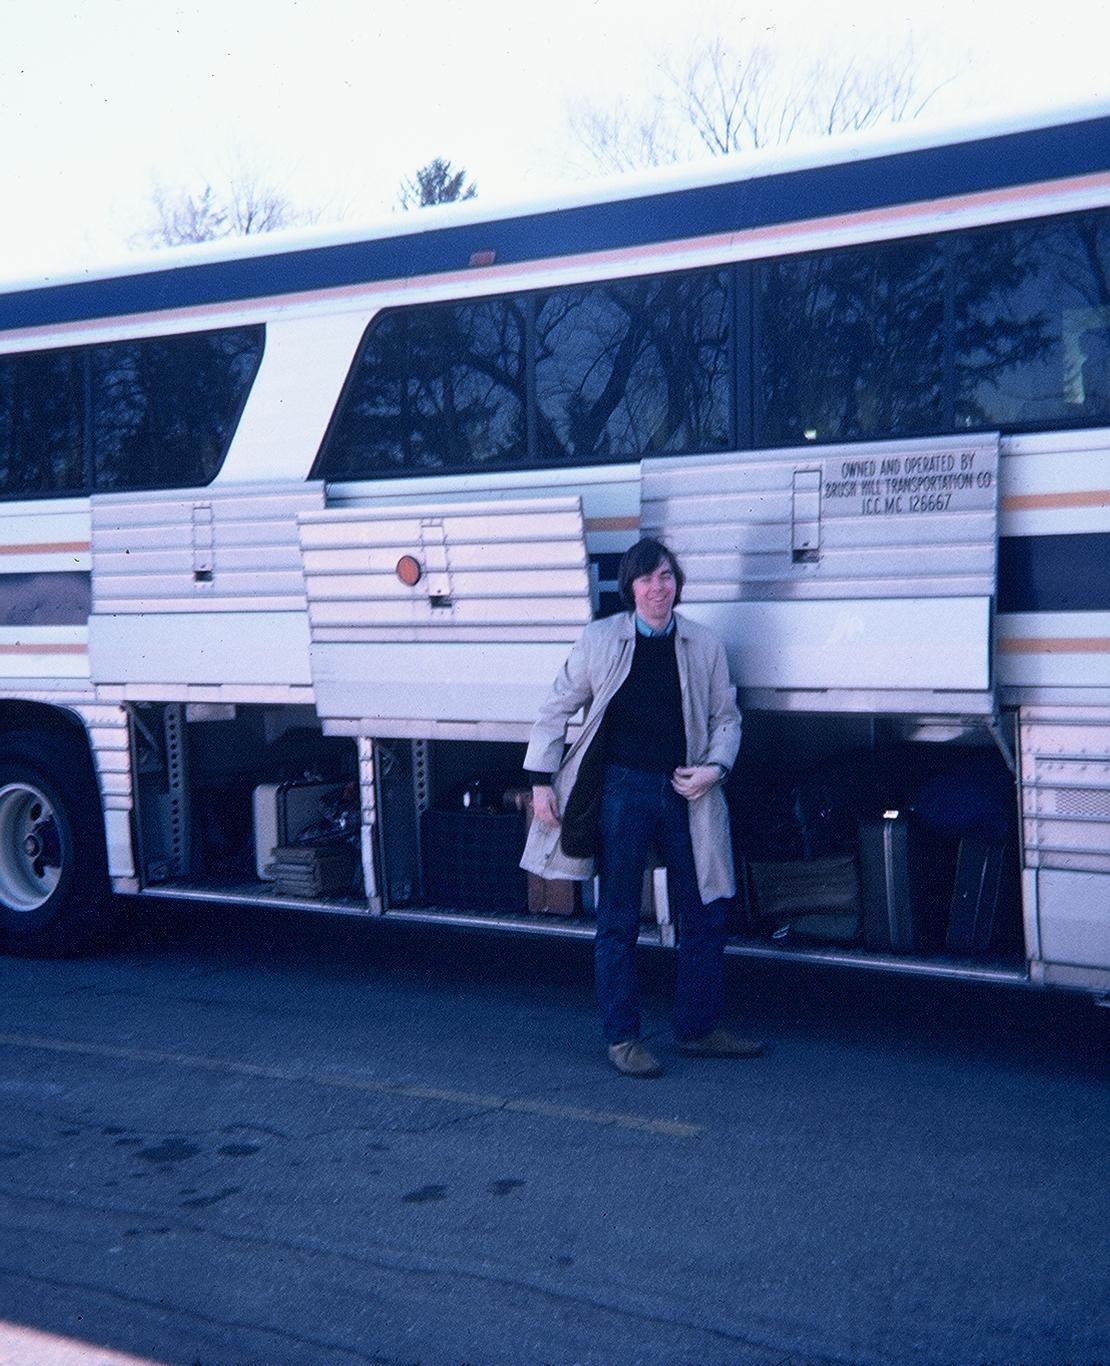 Spring_tour_1975_Birmingham_MI_staudt4-R1-E032.jpg